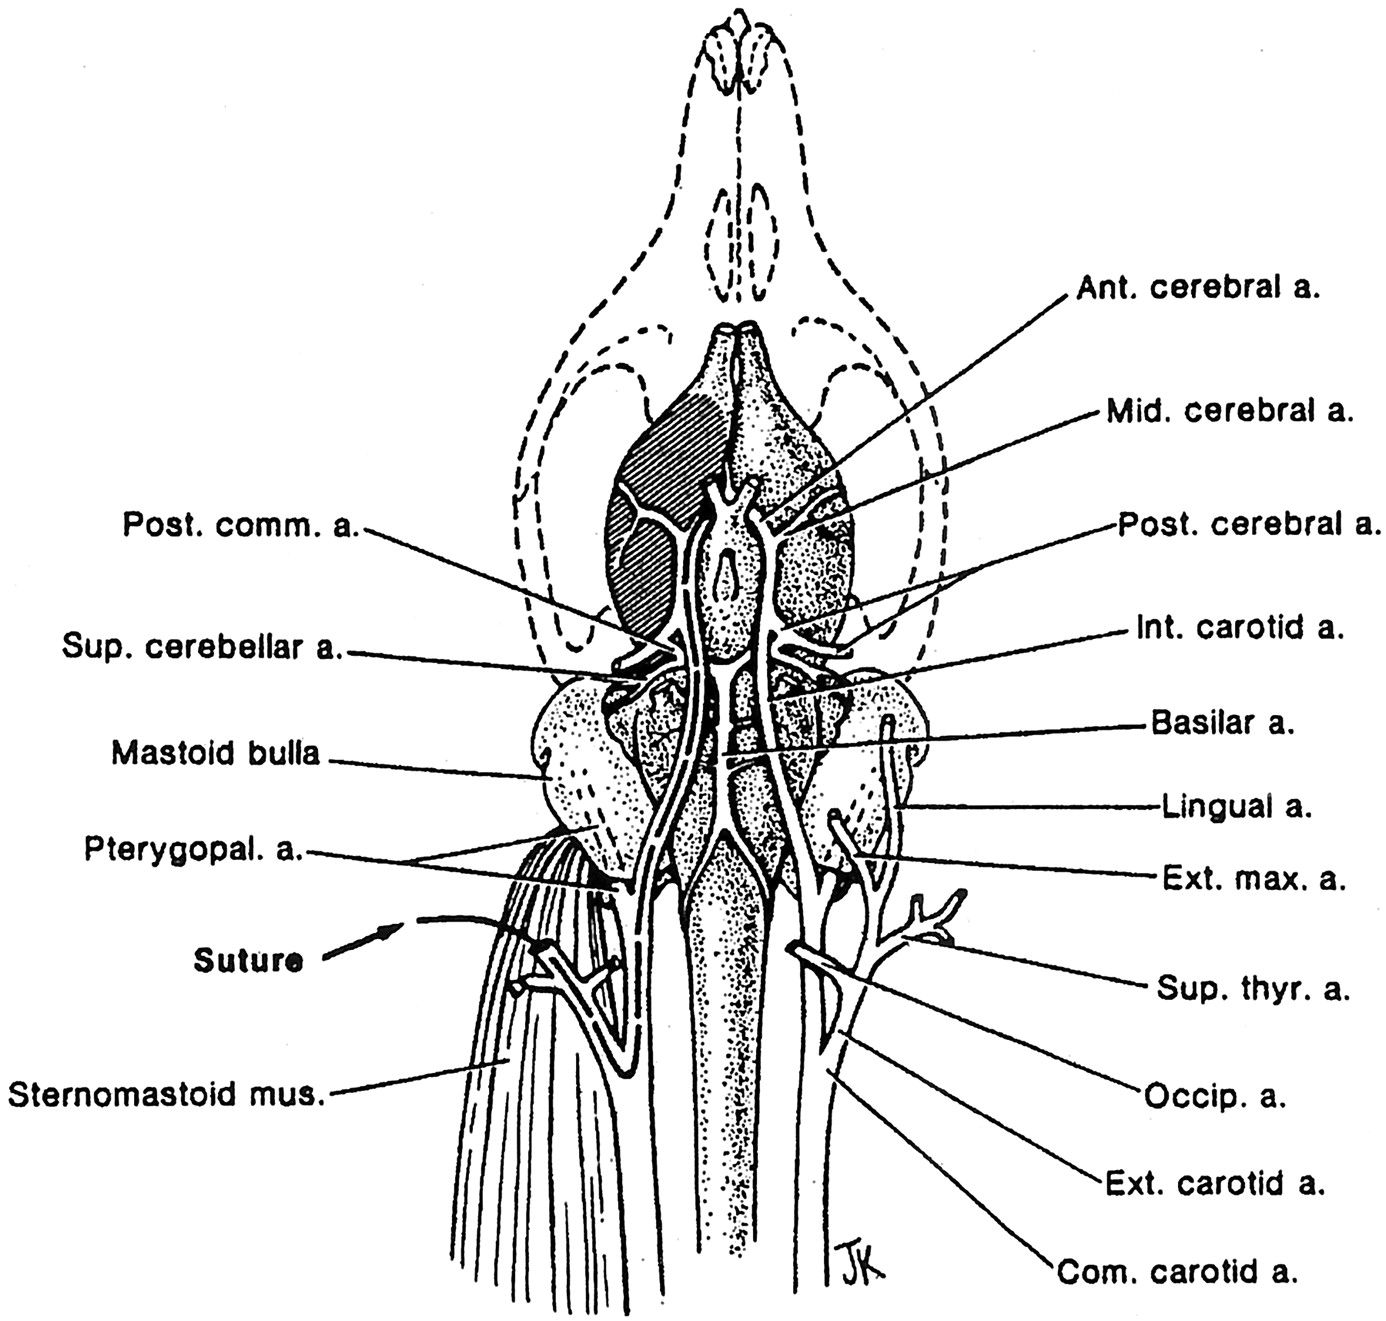 Rat Arteries Diagram - Search For Wiring Diagrams •